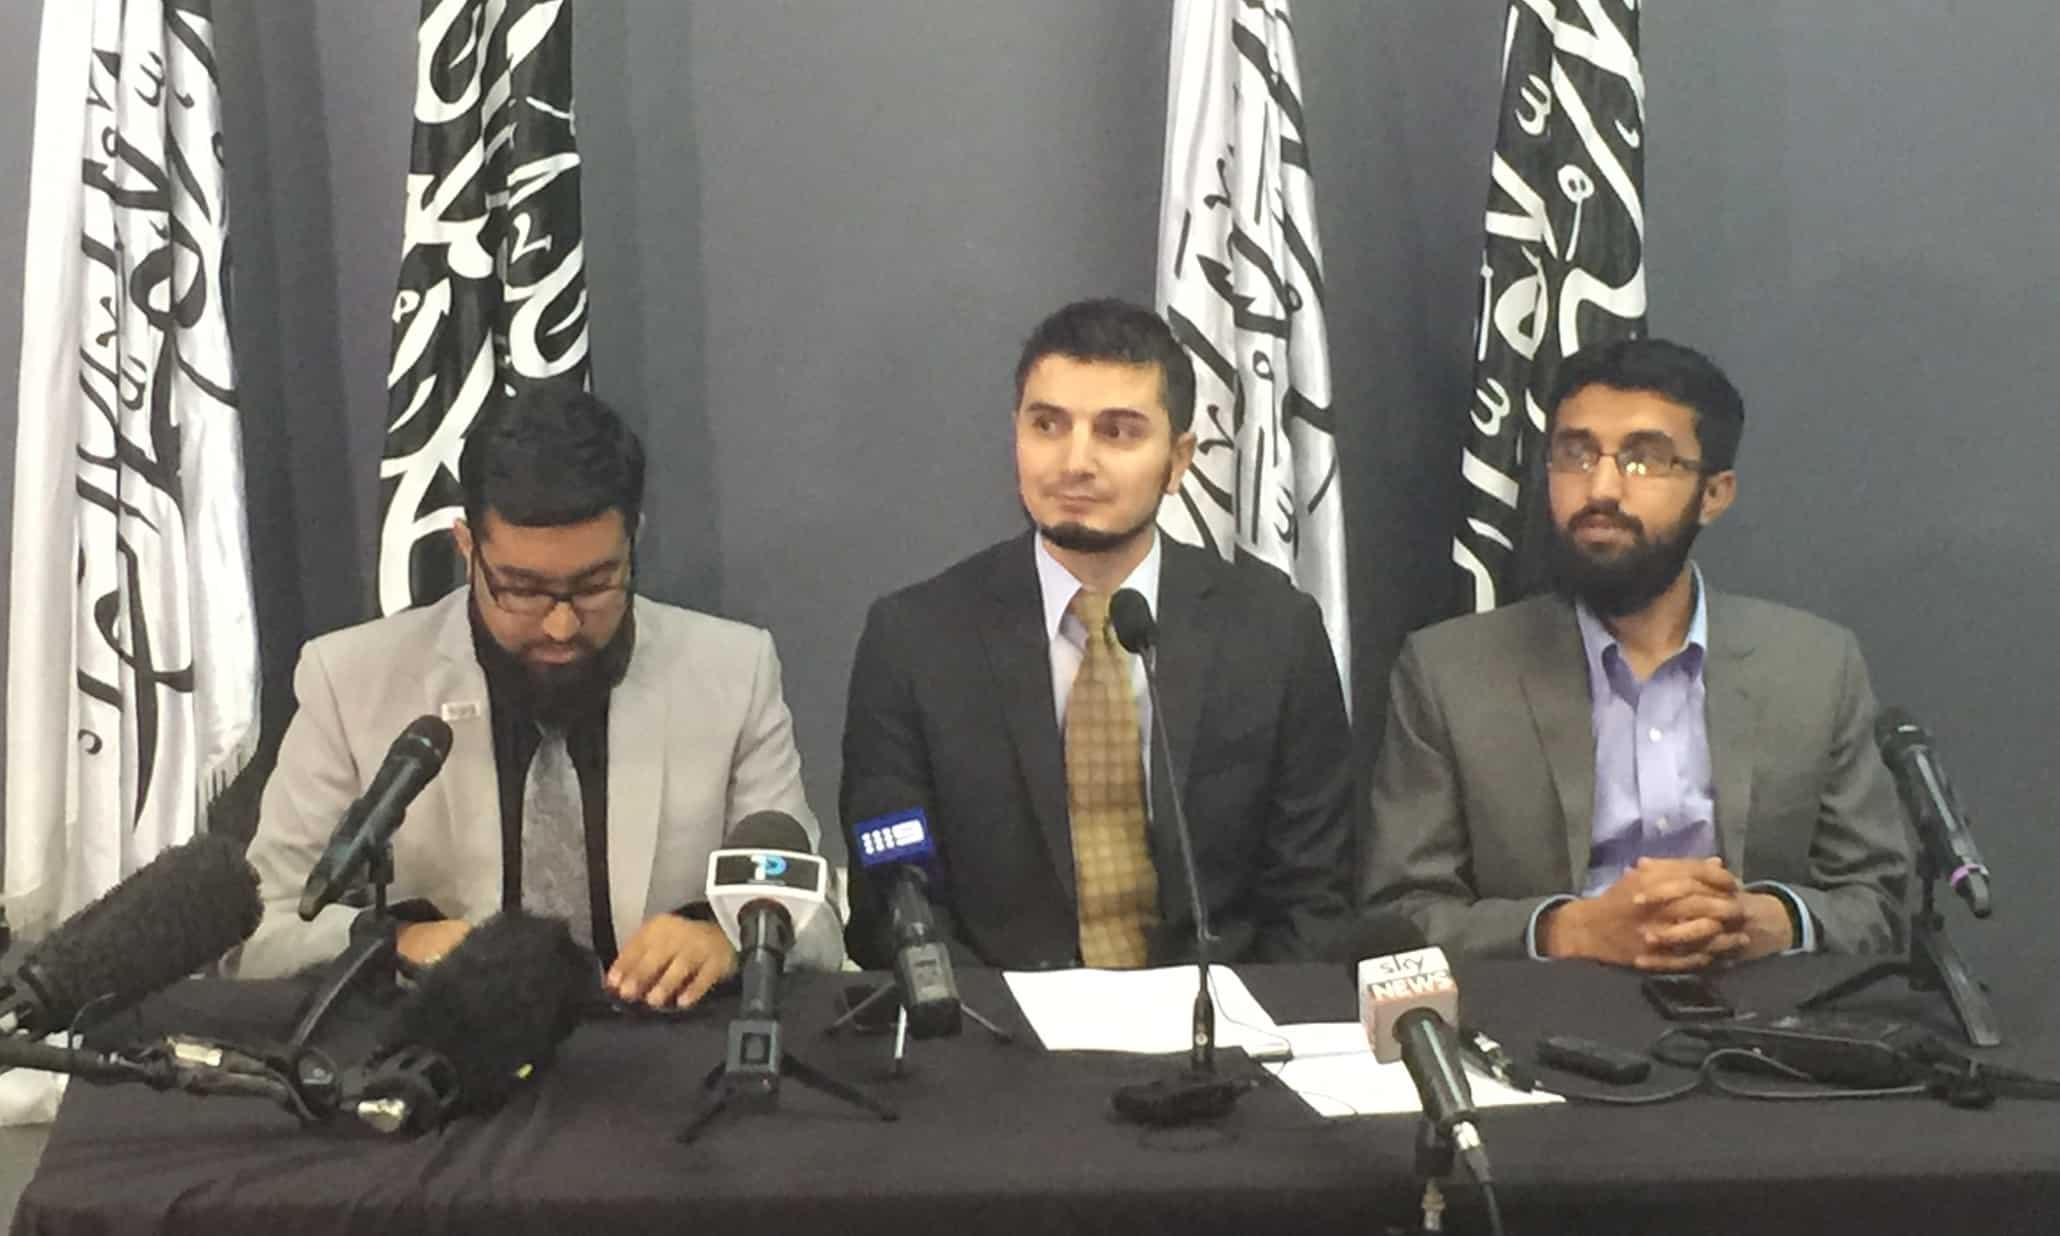 Press Conference – Crackdown on Hizb ut-Tahrir